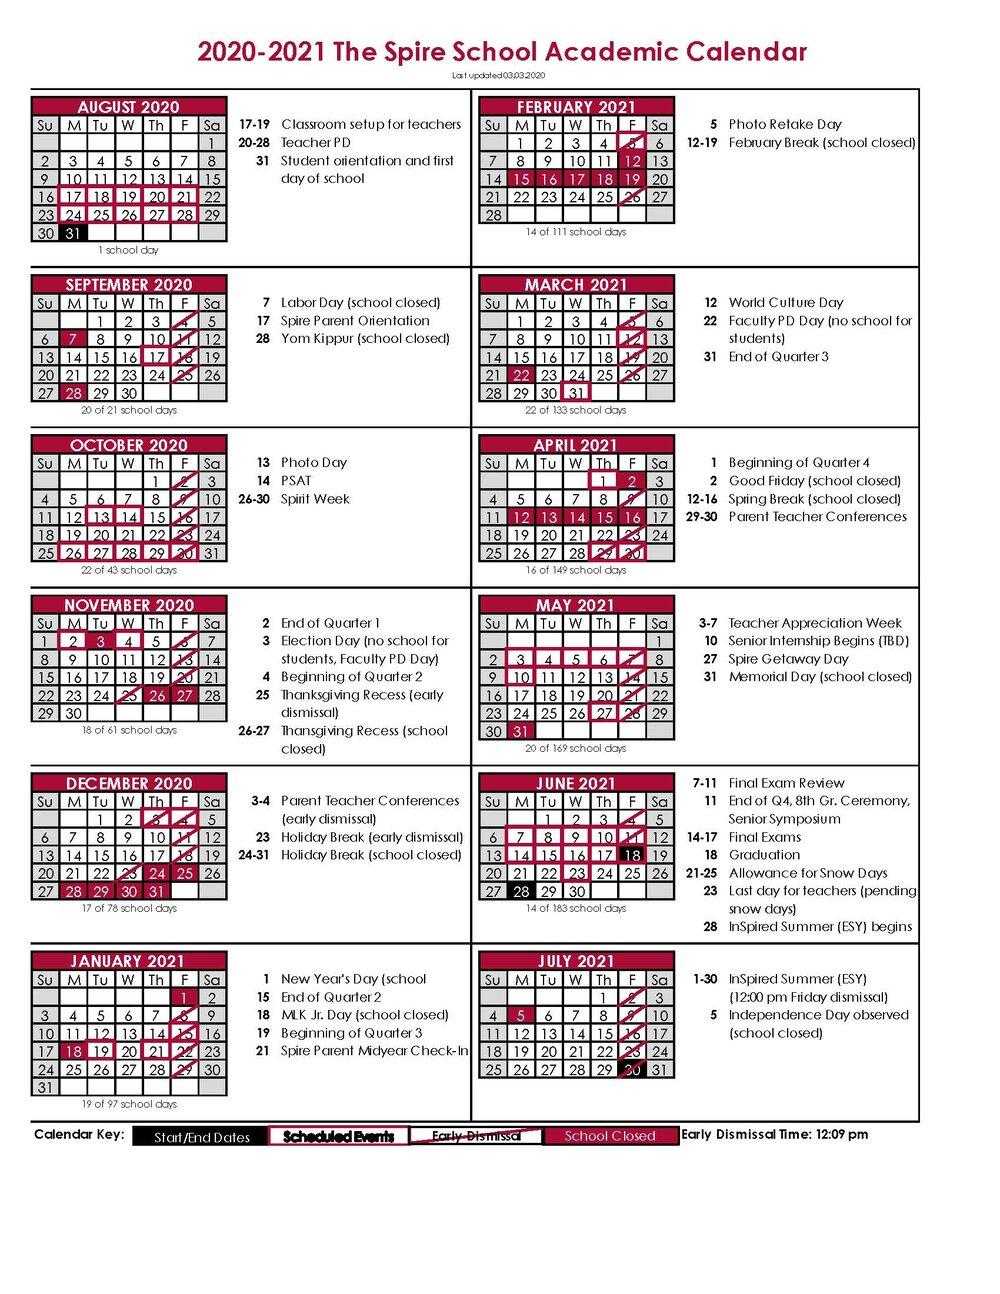 Academic Calendar — The Spire School With Rye Country Day School Calendar 2021